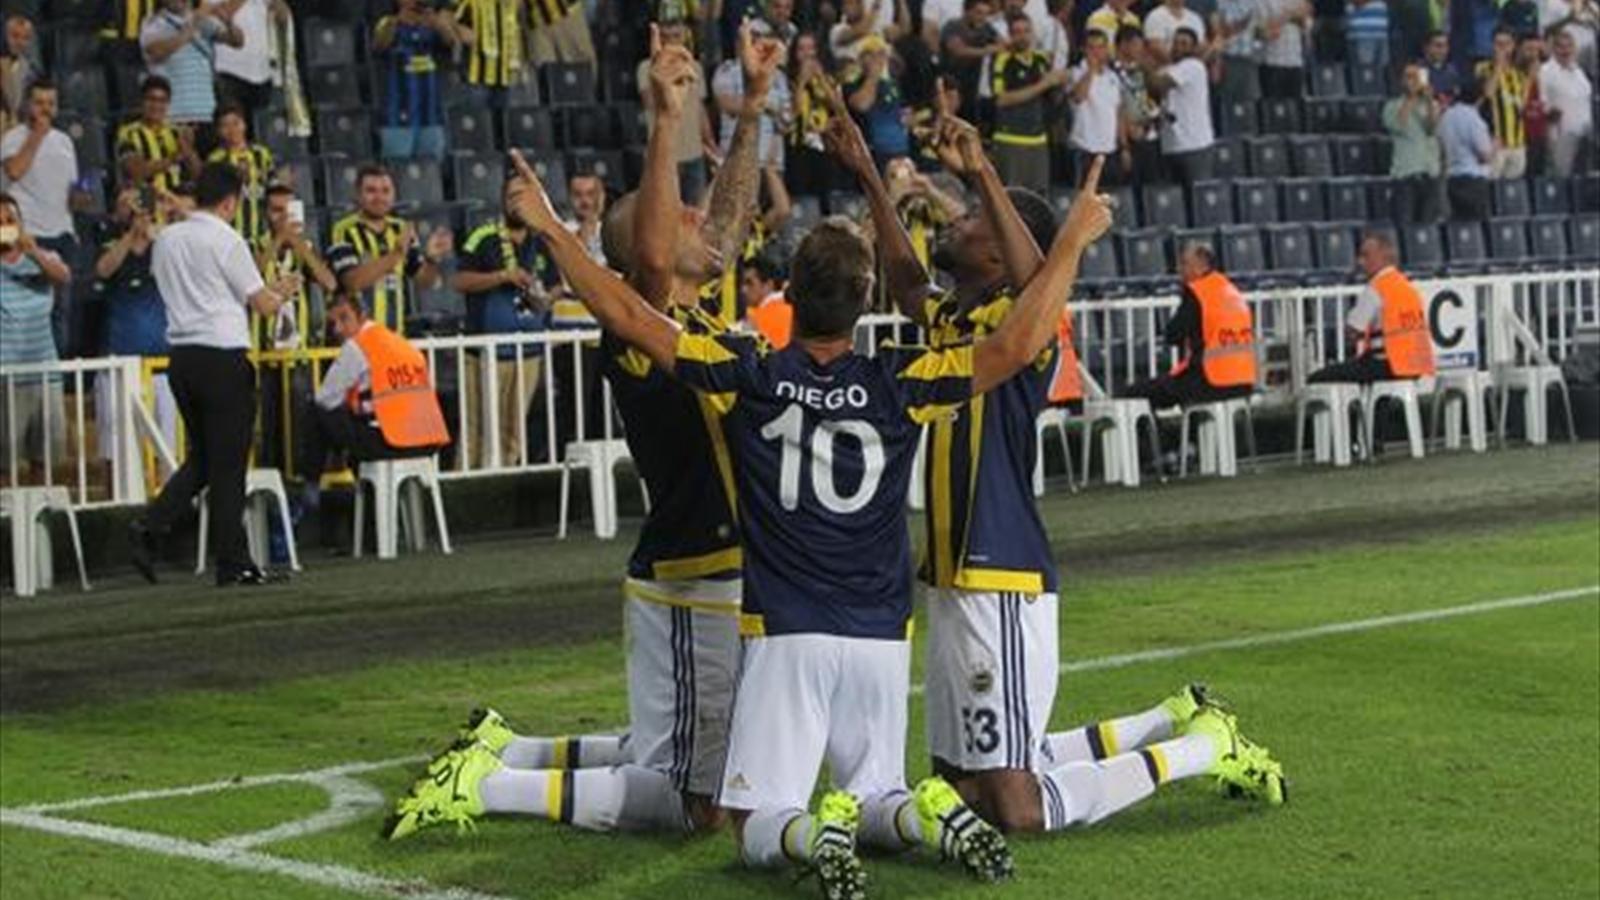 UEFA Avrupa Ligi: Fenerbahçe 3-0 Atromitos (MAÇ ÖZETİ)